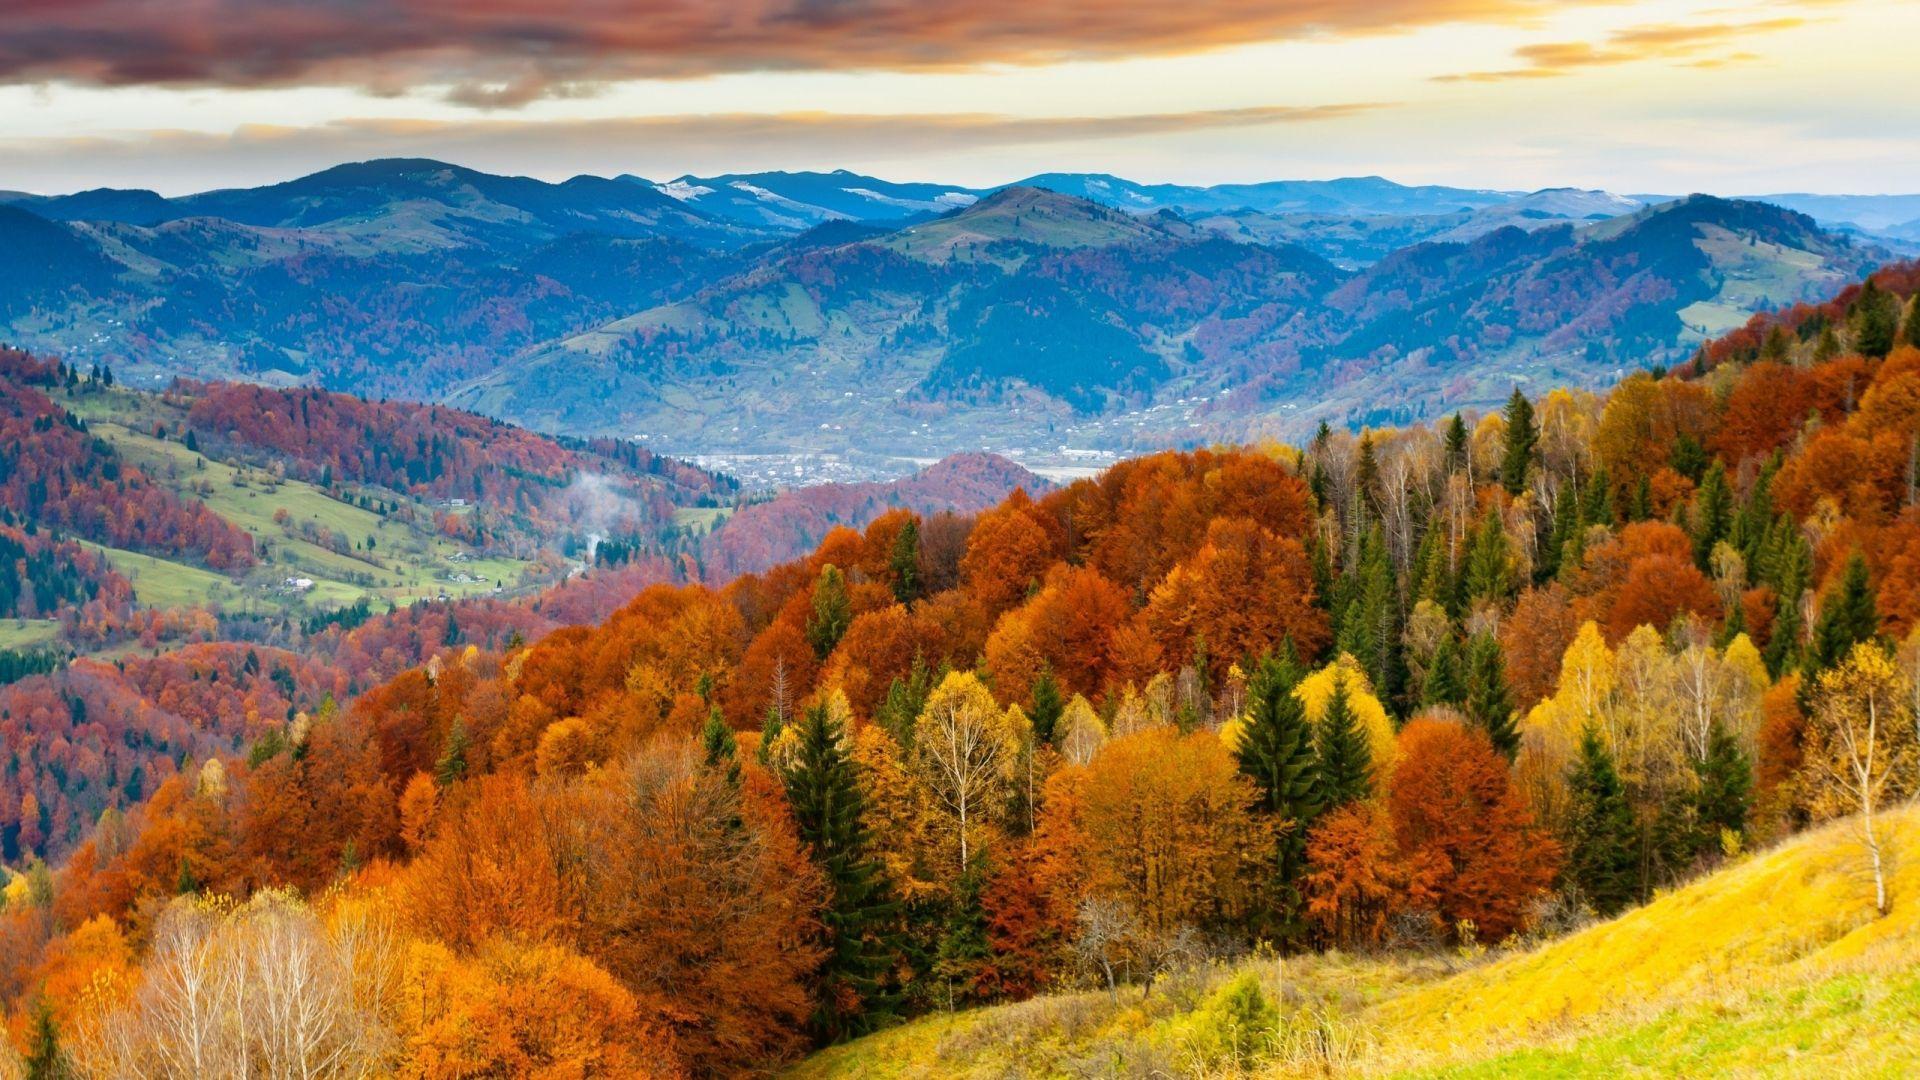 Mountain Landscape Autumn Wallpapers Wallpaper Cave